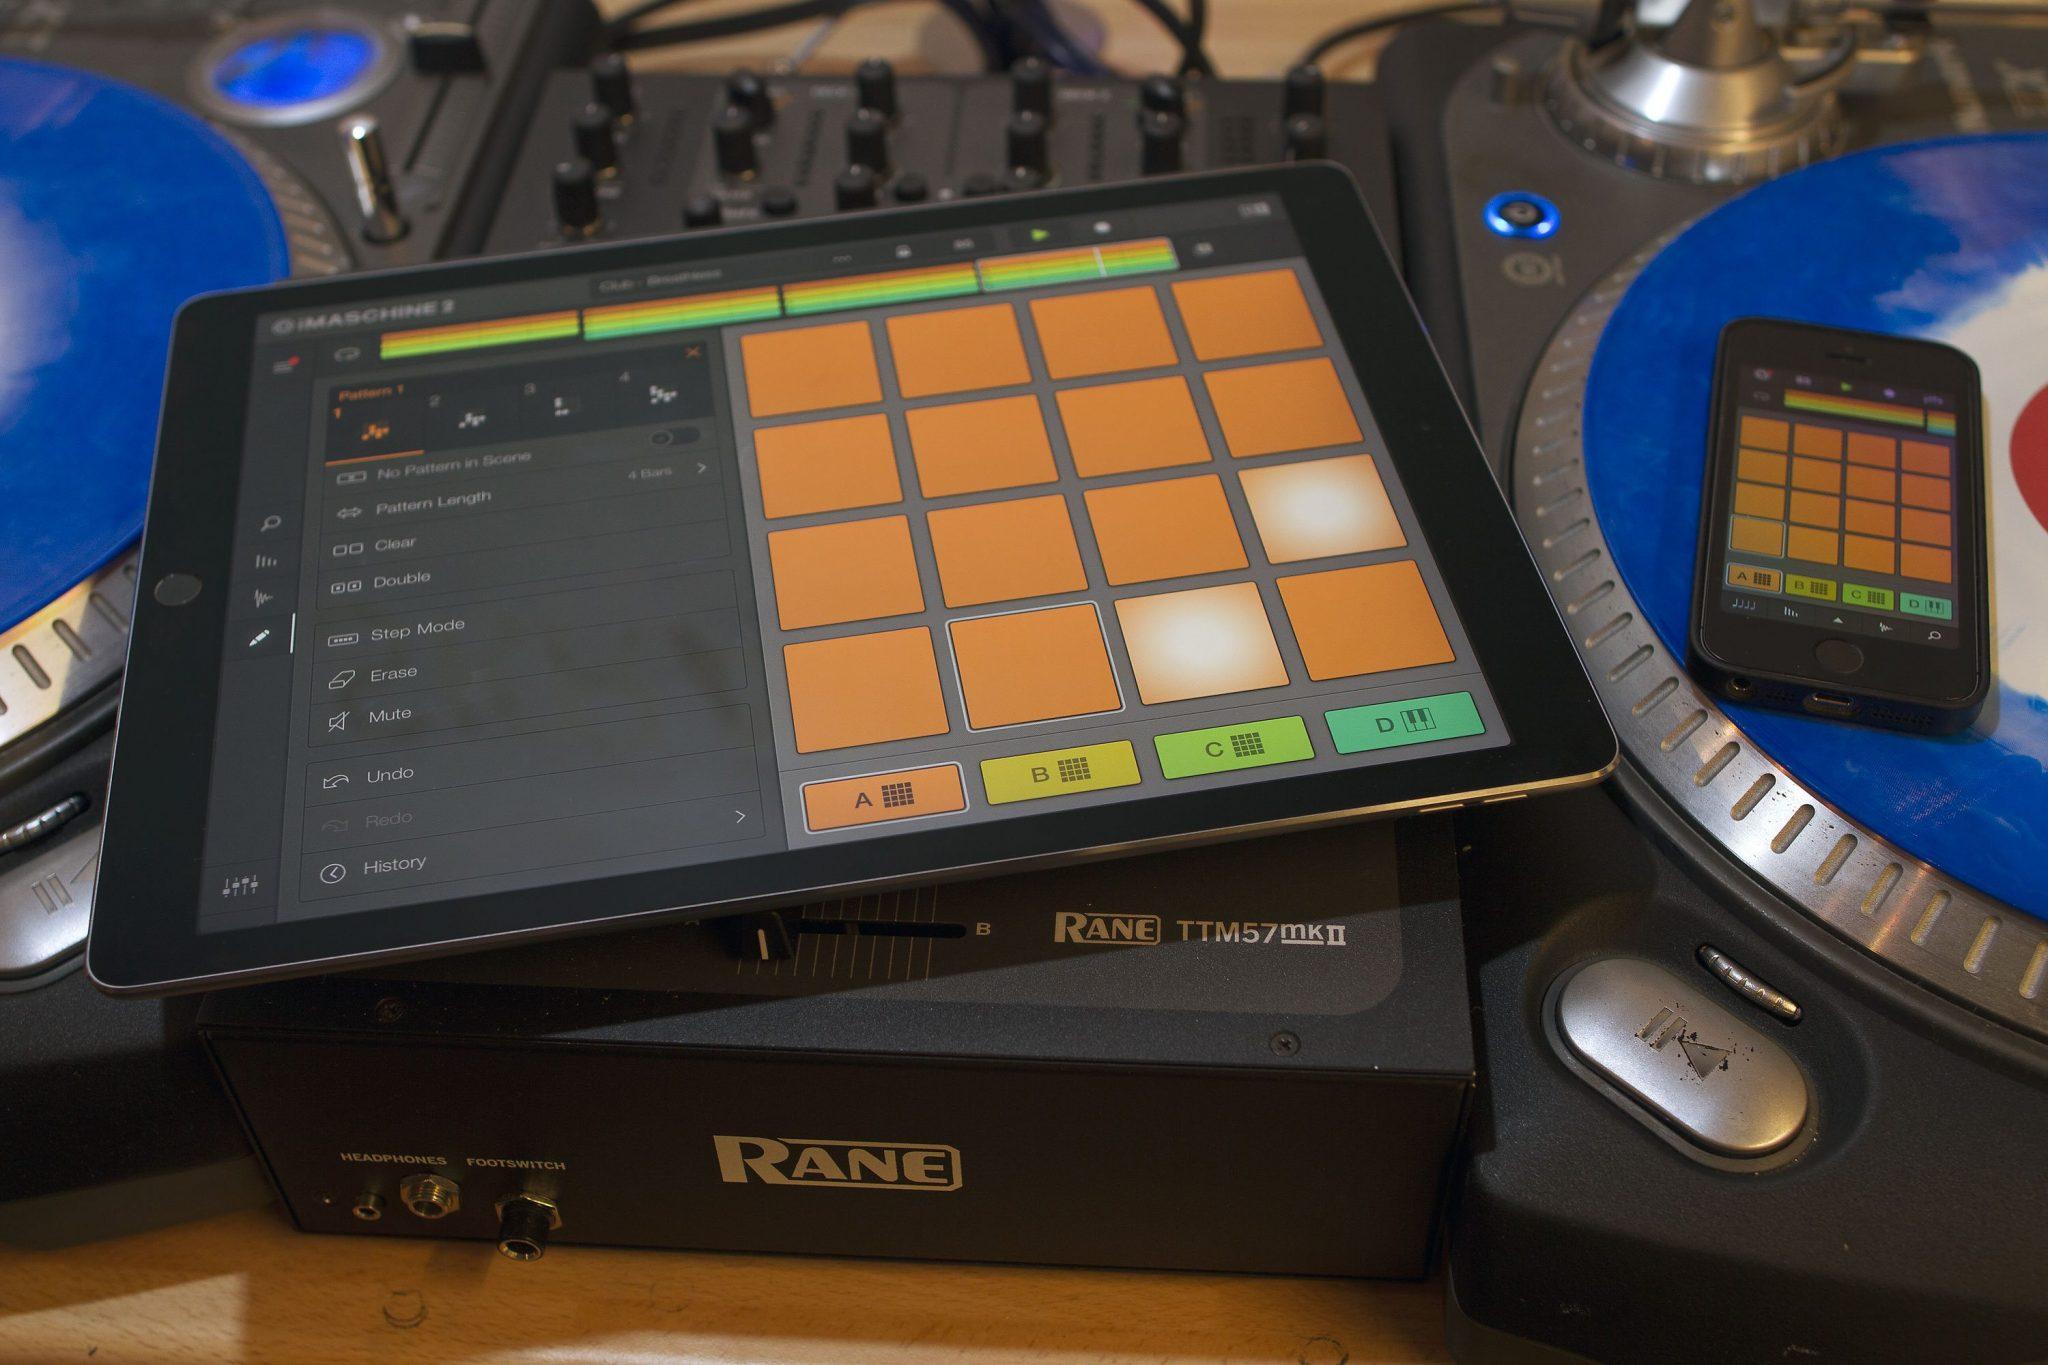 Native instruments iMaschine2 iPad Pro